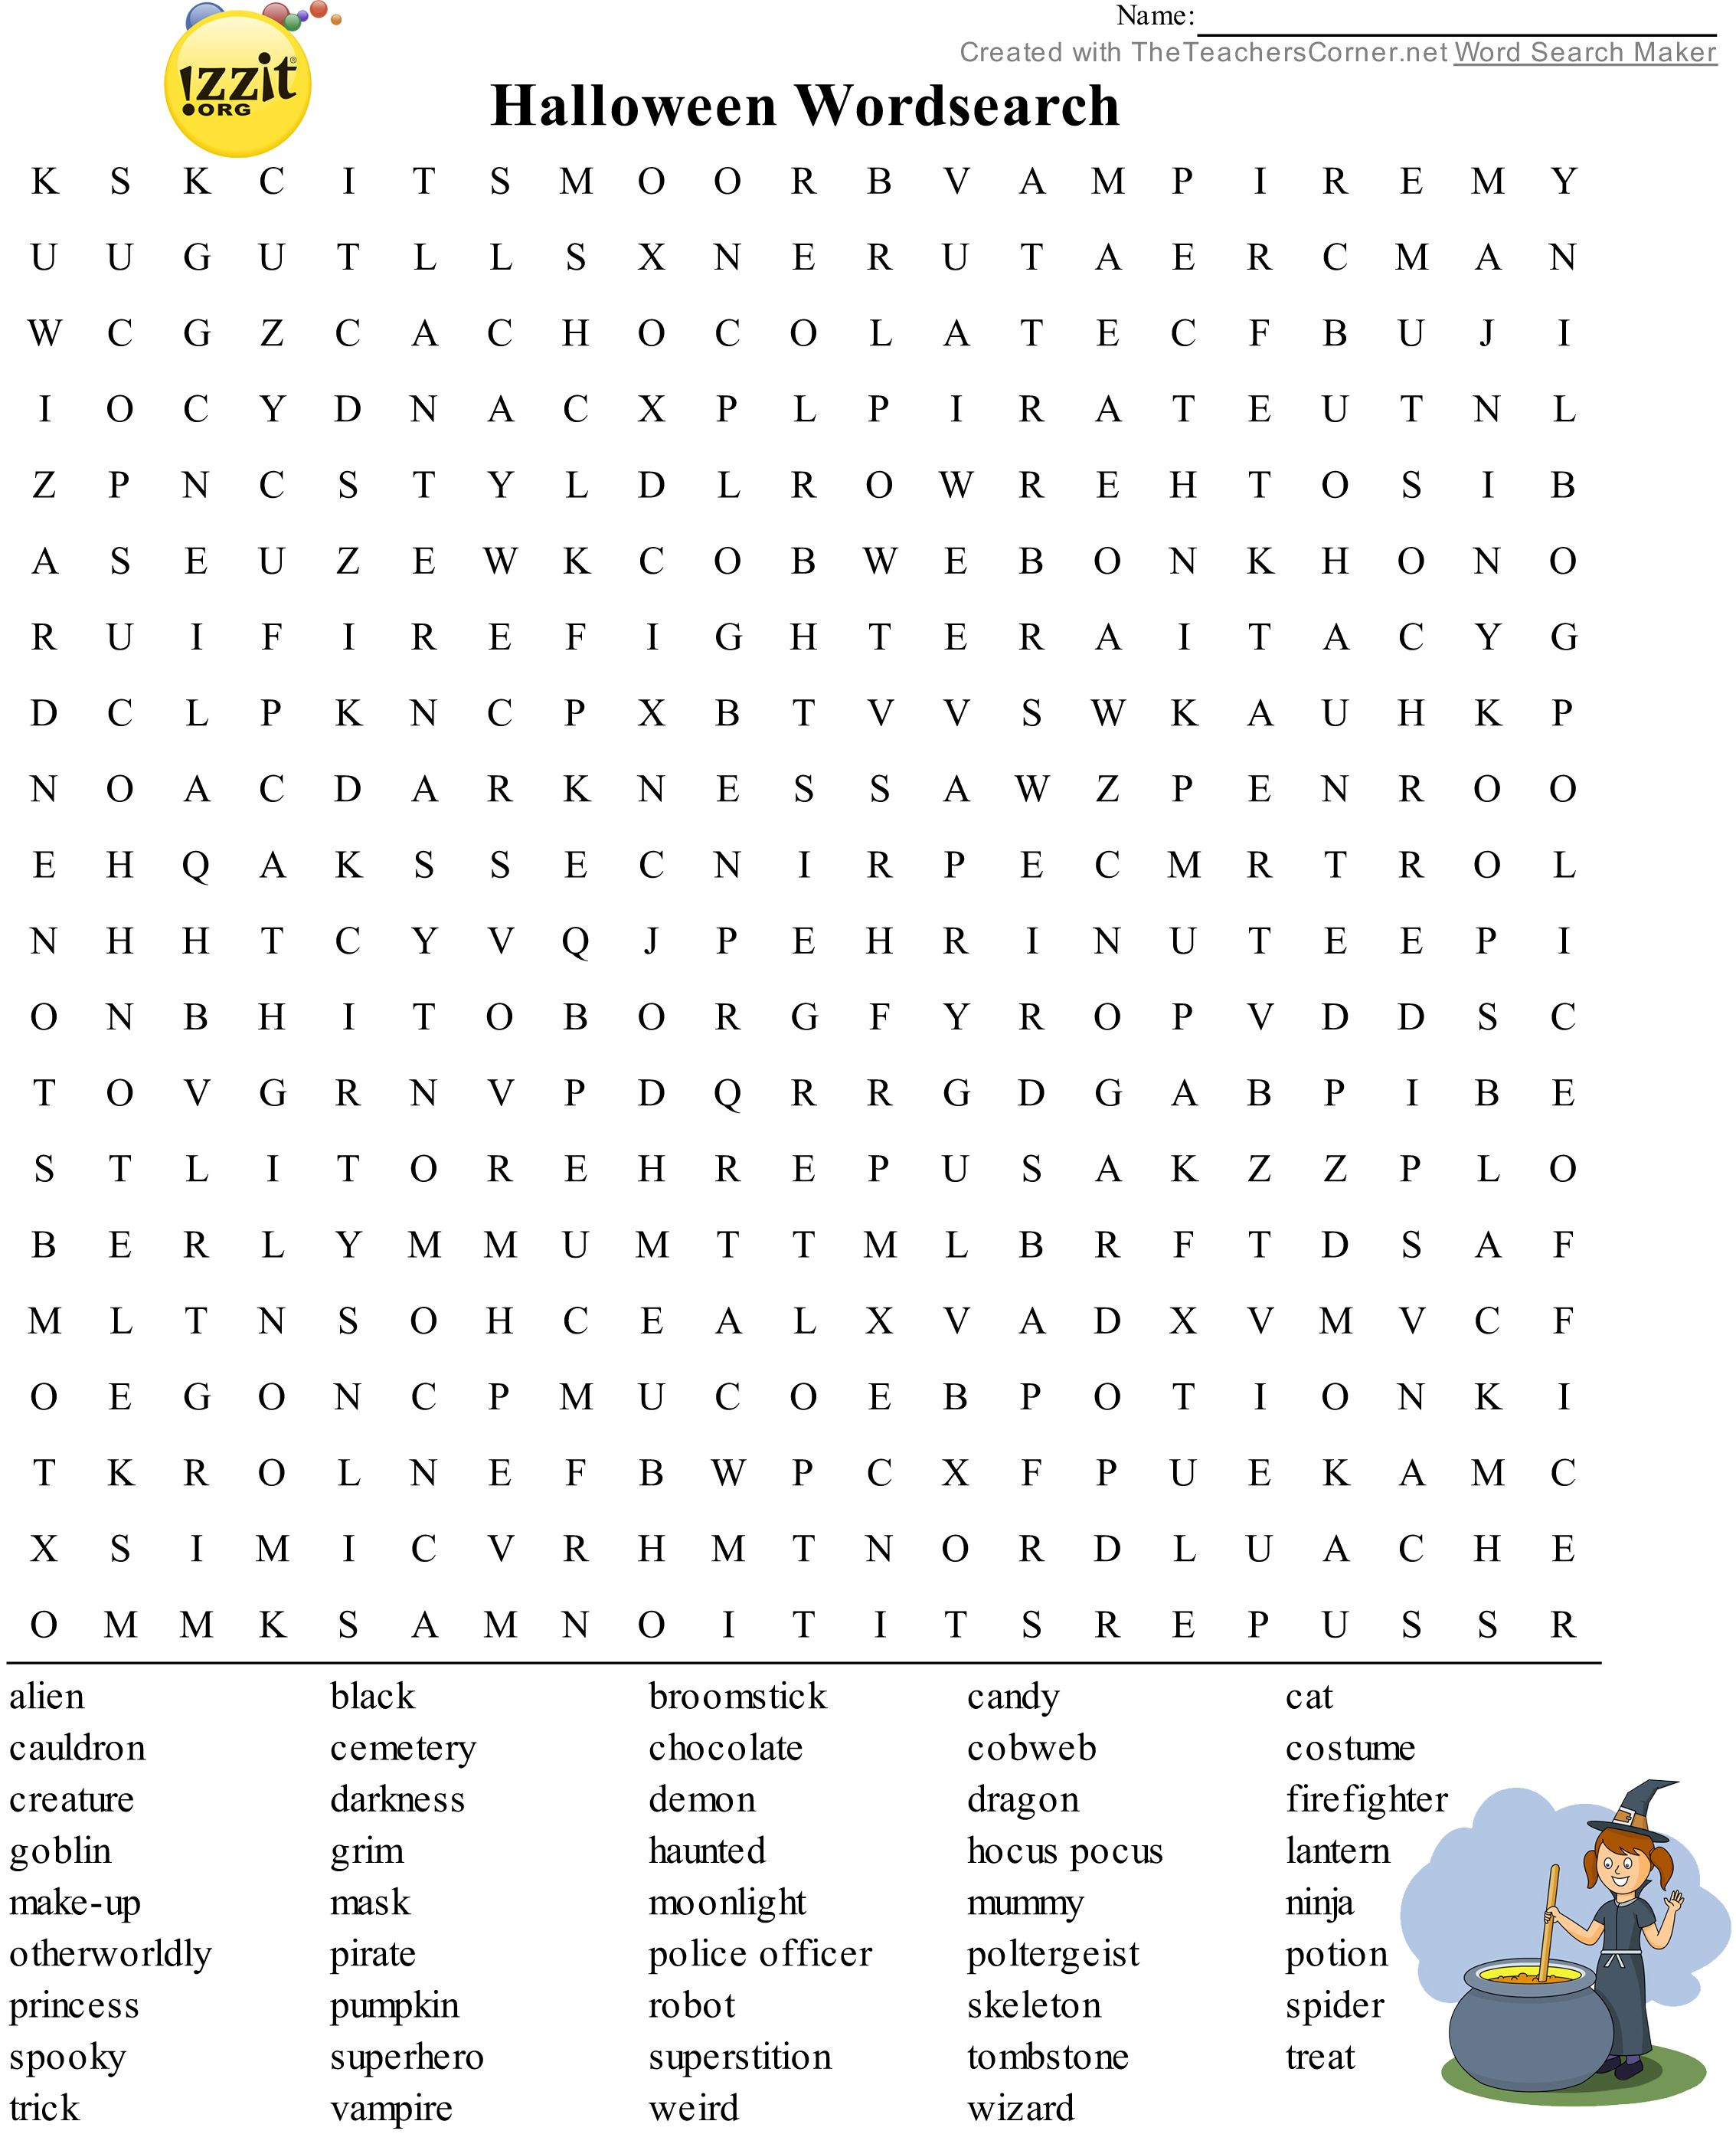 Halloween Word Search - Hard #happyhalloween 💀👻🎃 | Classroom - Printable Grey's Anatomy Crossword Puzzles